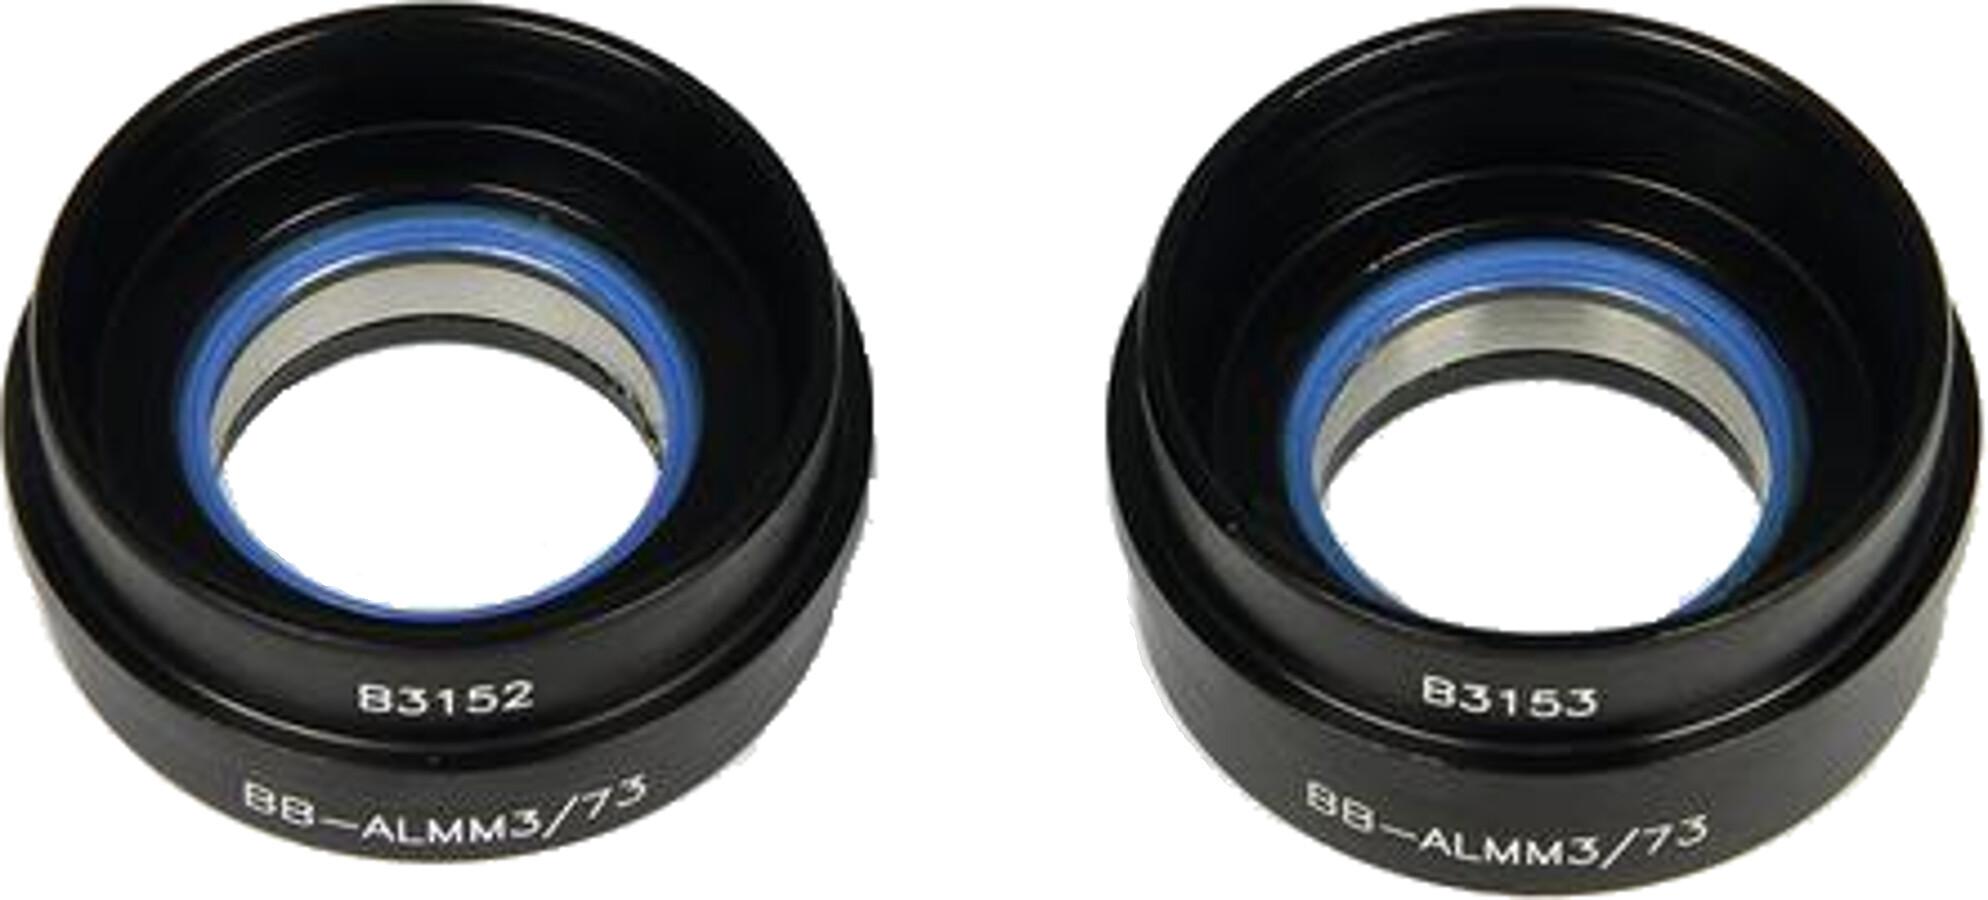 FSA BB30 MTB Mega Exo One Adapter 73mm, black (2019) | Bottom brackets